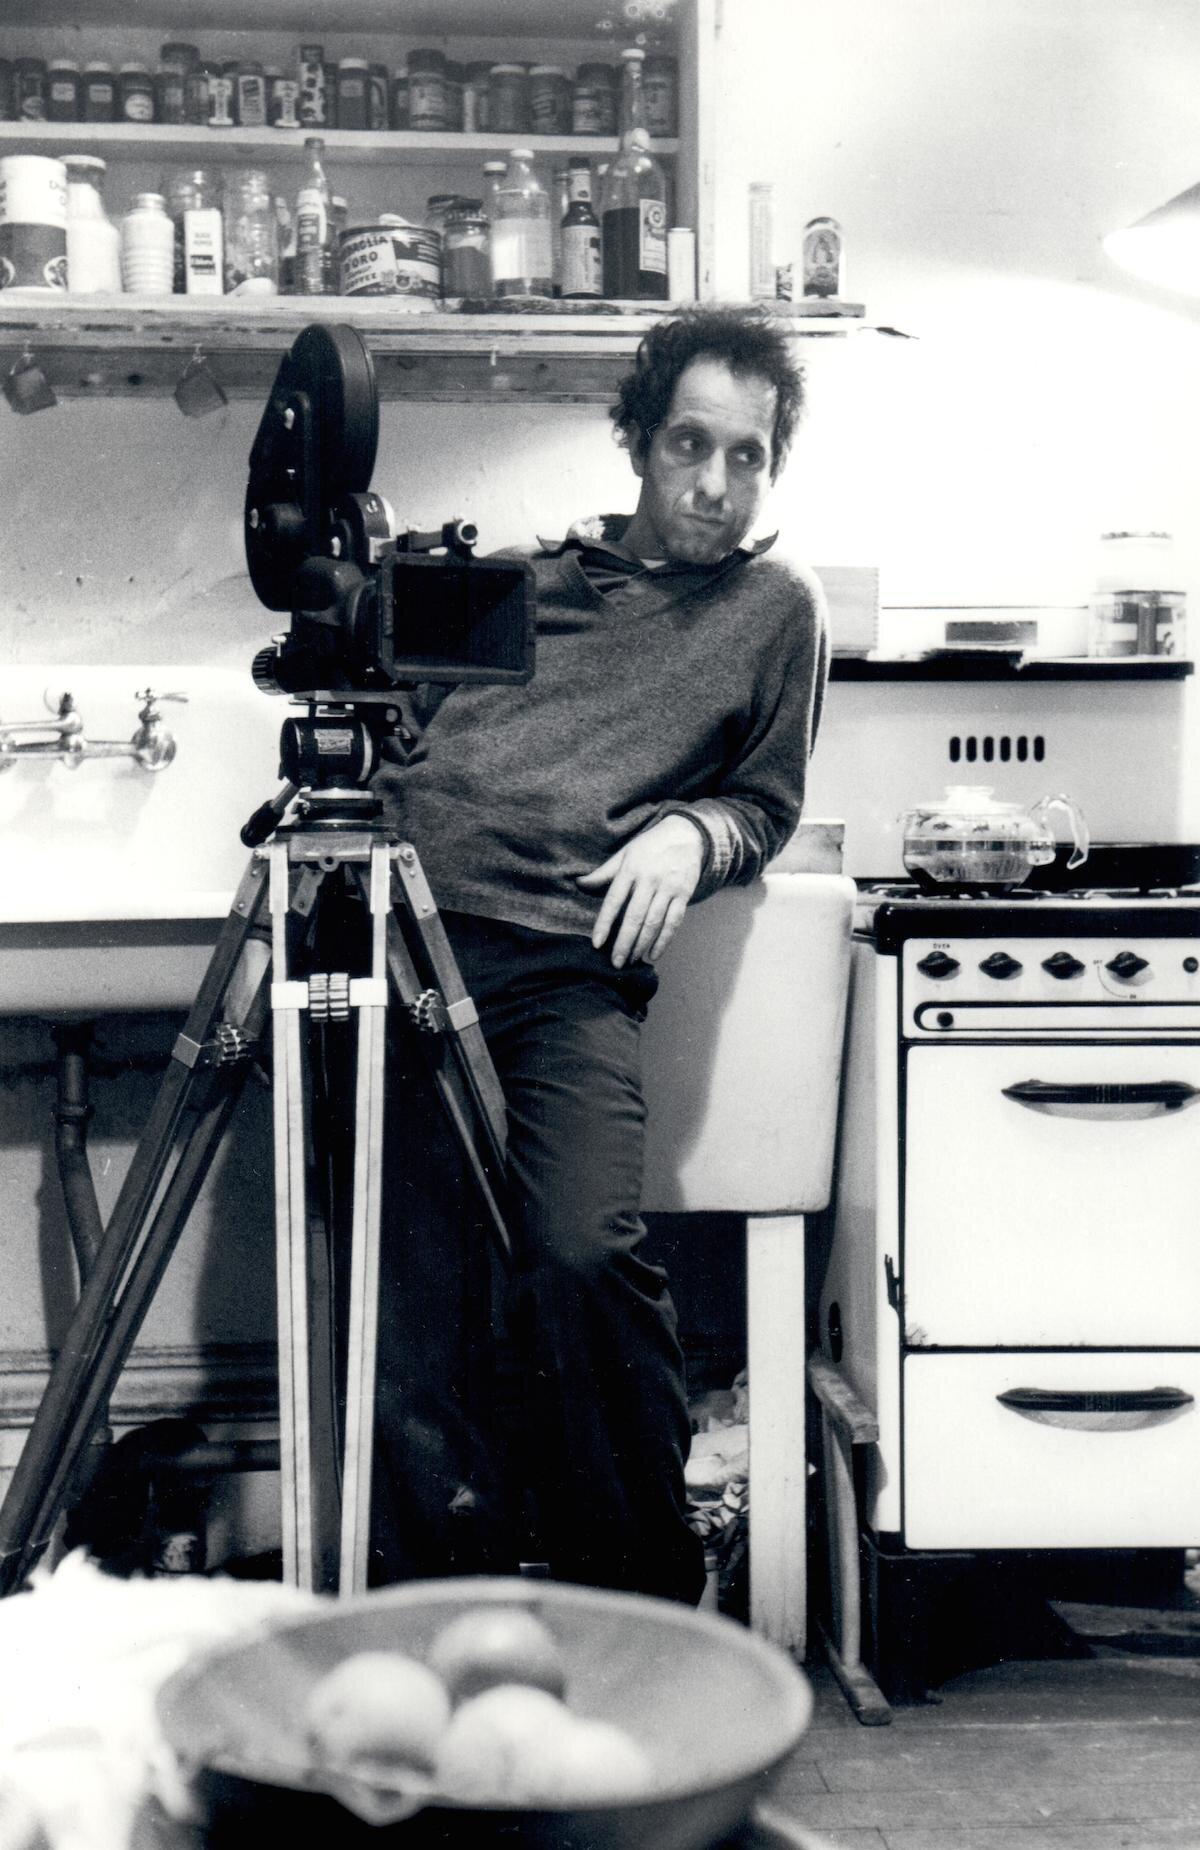 Frank with camera in kitchen XL.jpg